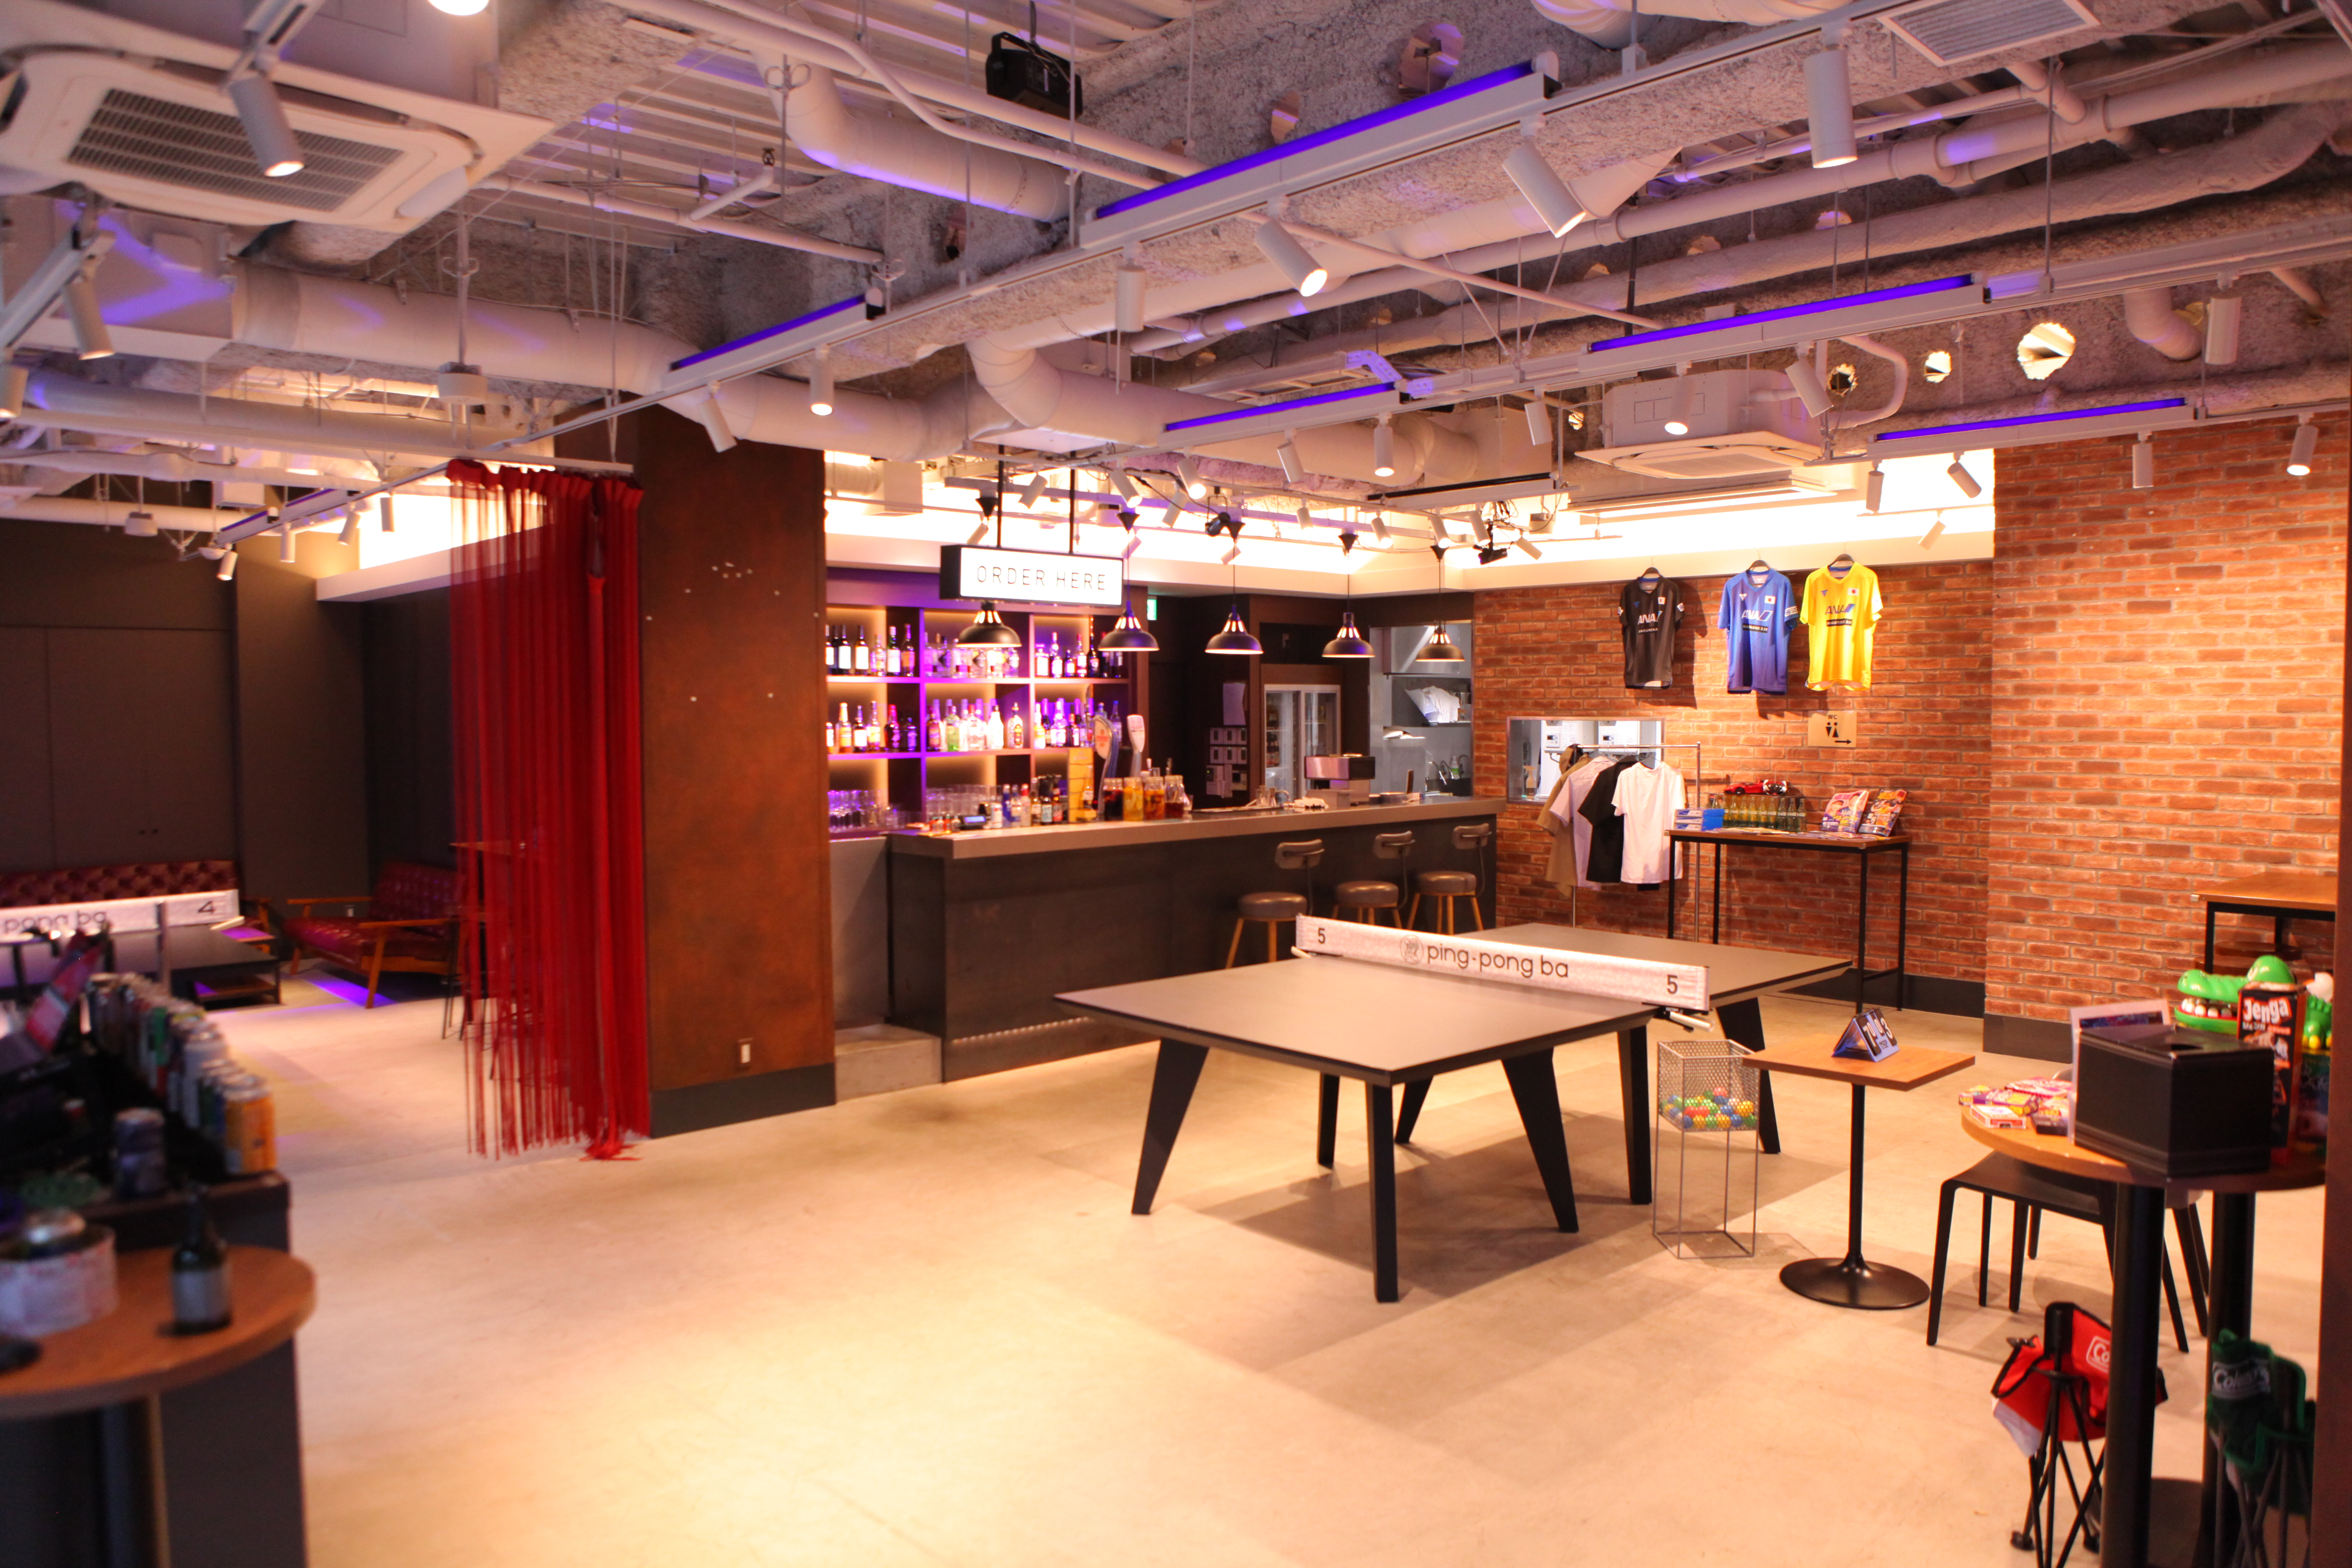 ba 01 多目的スペースの室内の写真